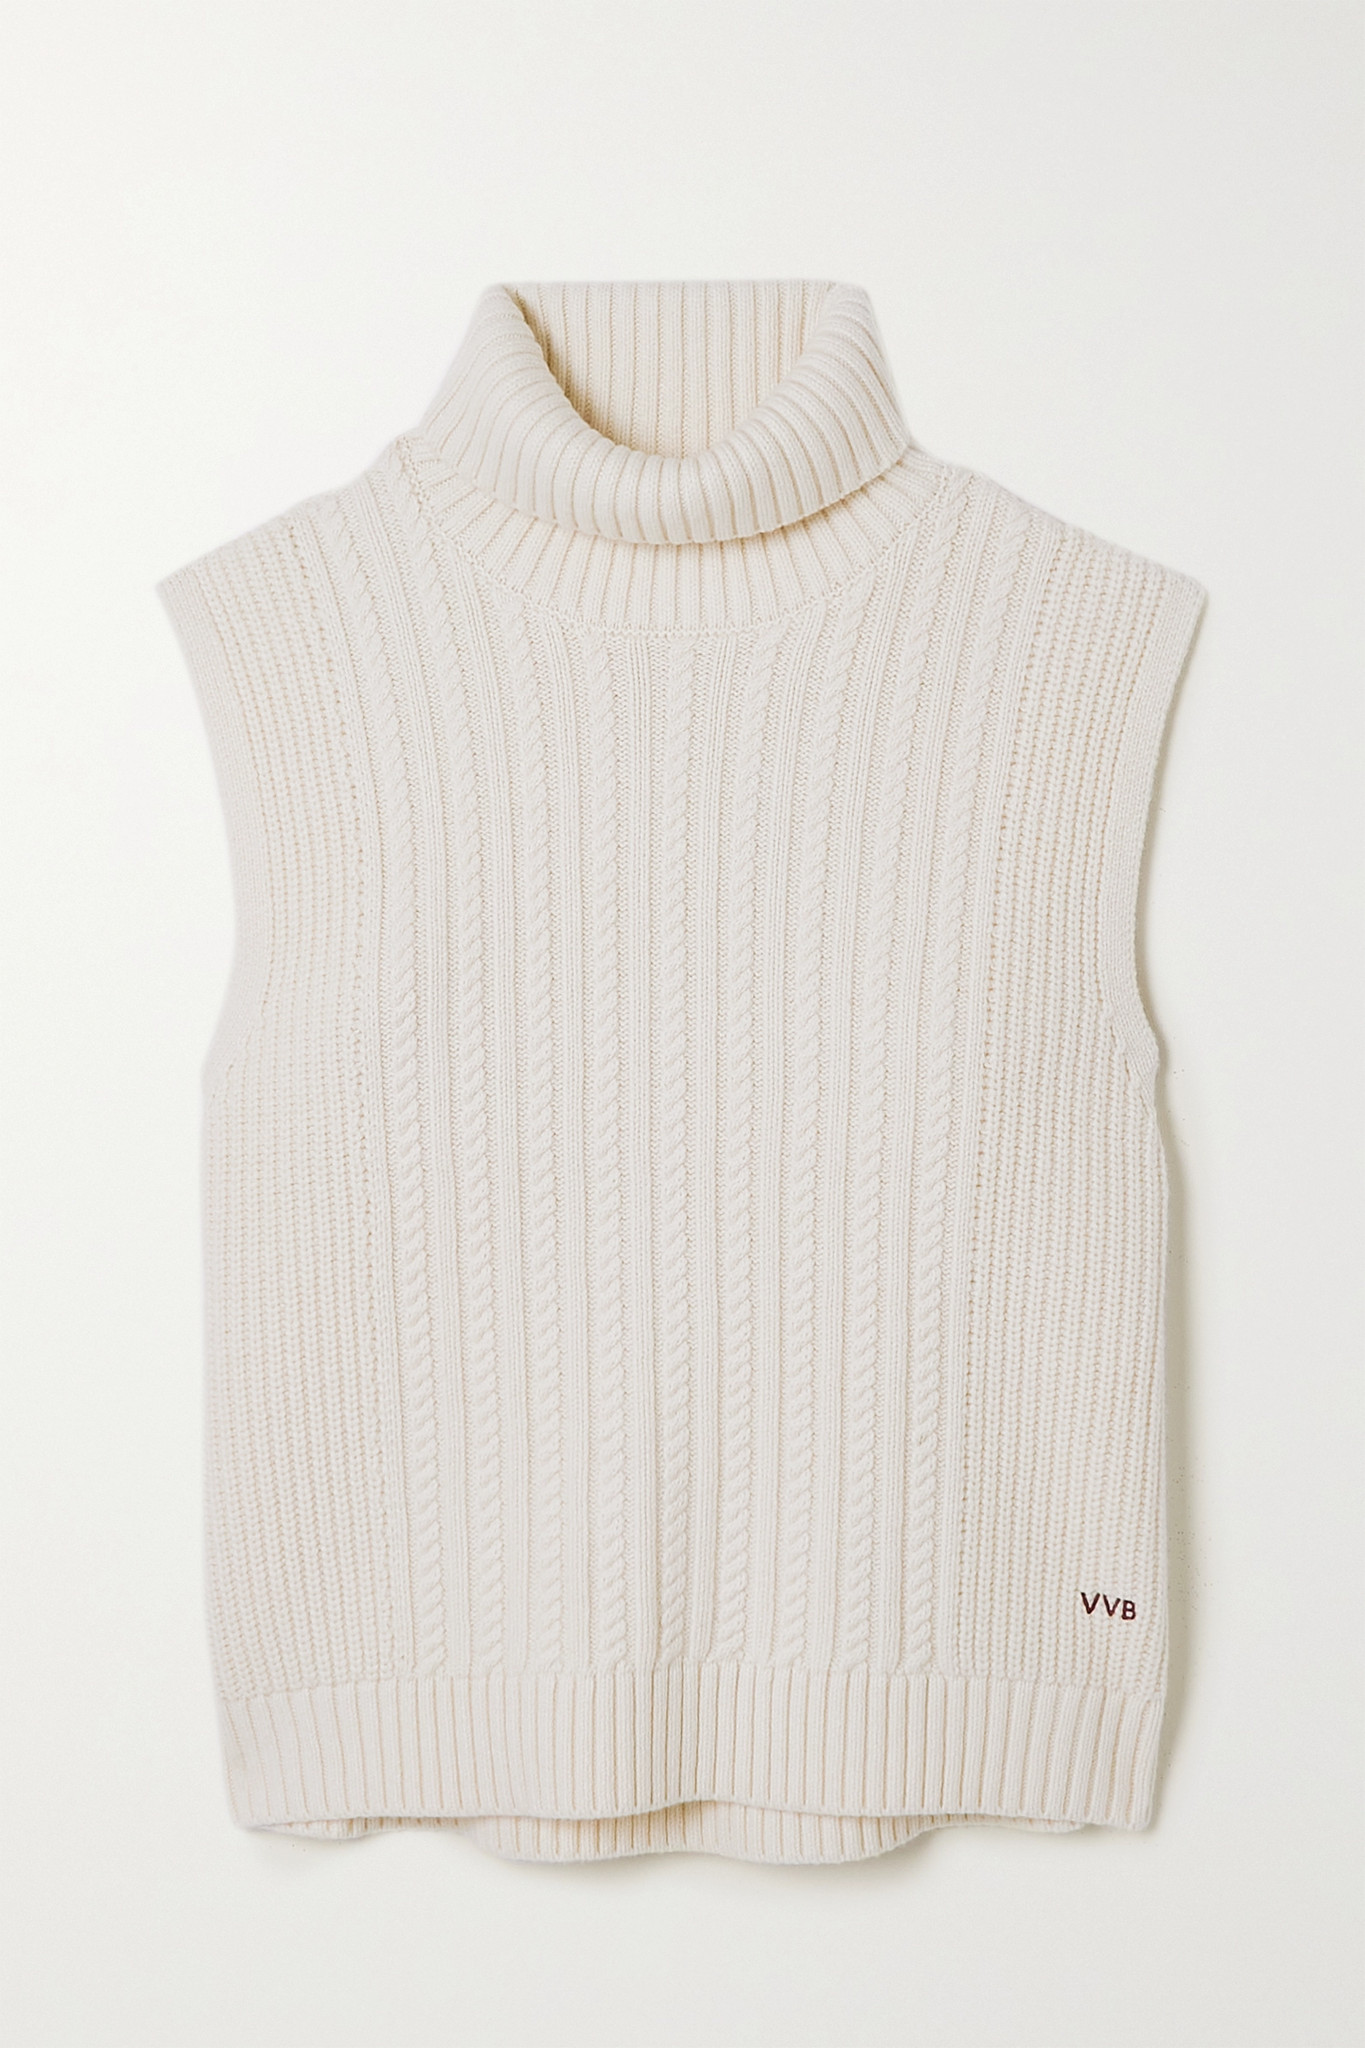 VICTORIA, VICTORIA BECKHAM - Cable-knit Turtleneck Sweater - Ivory - medium